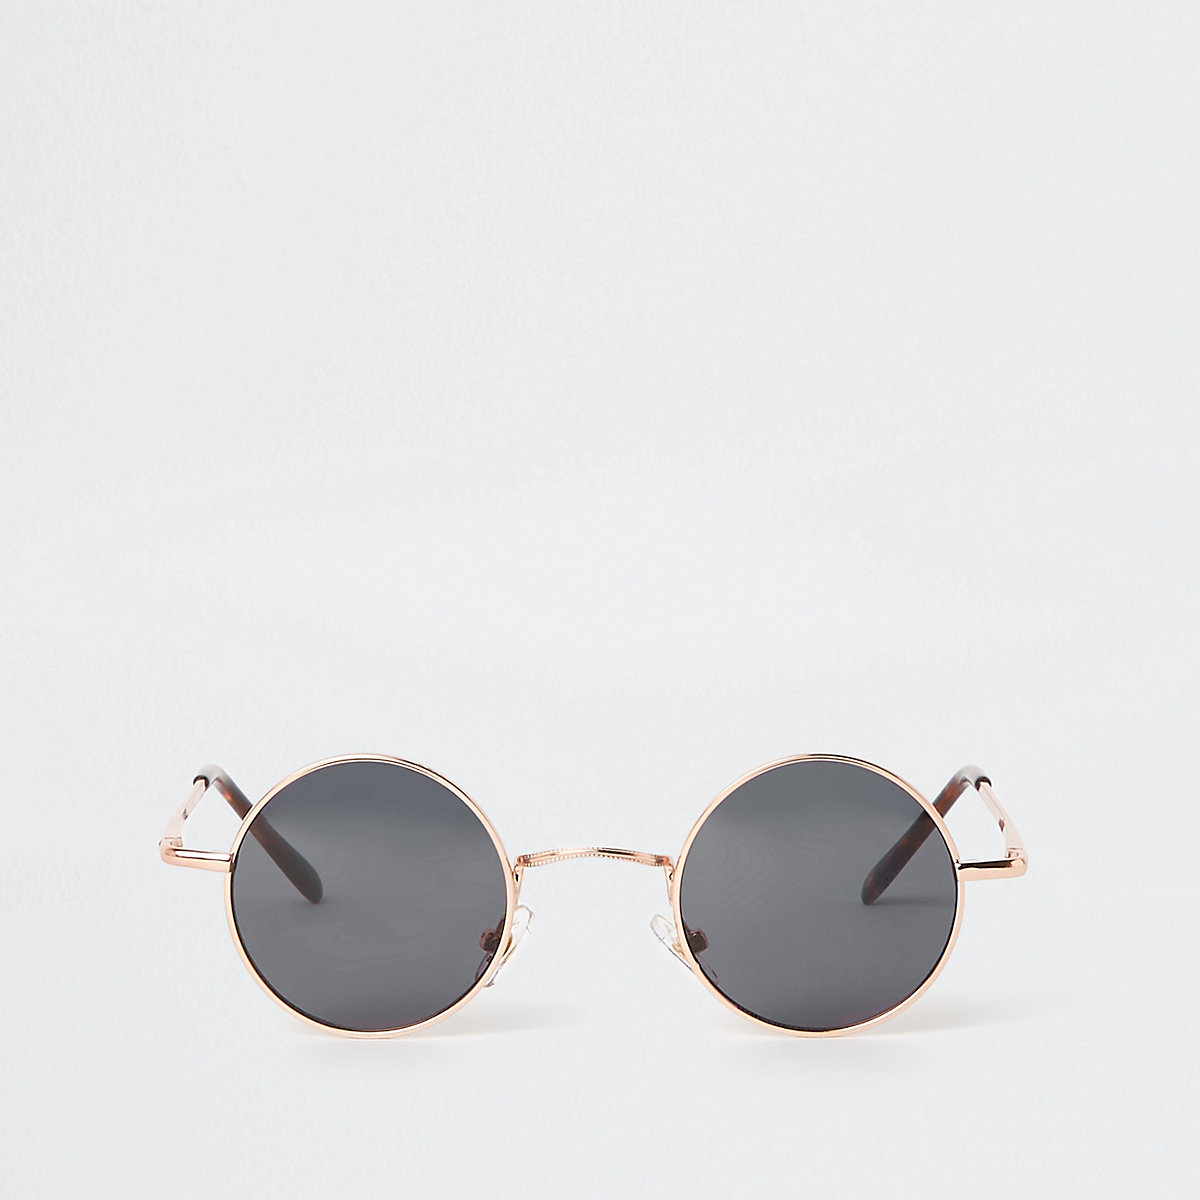 Gold tone small round smoke lens sunglasses